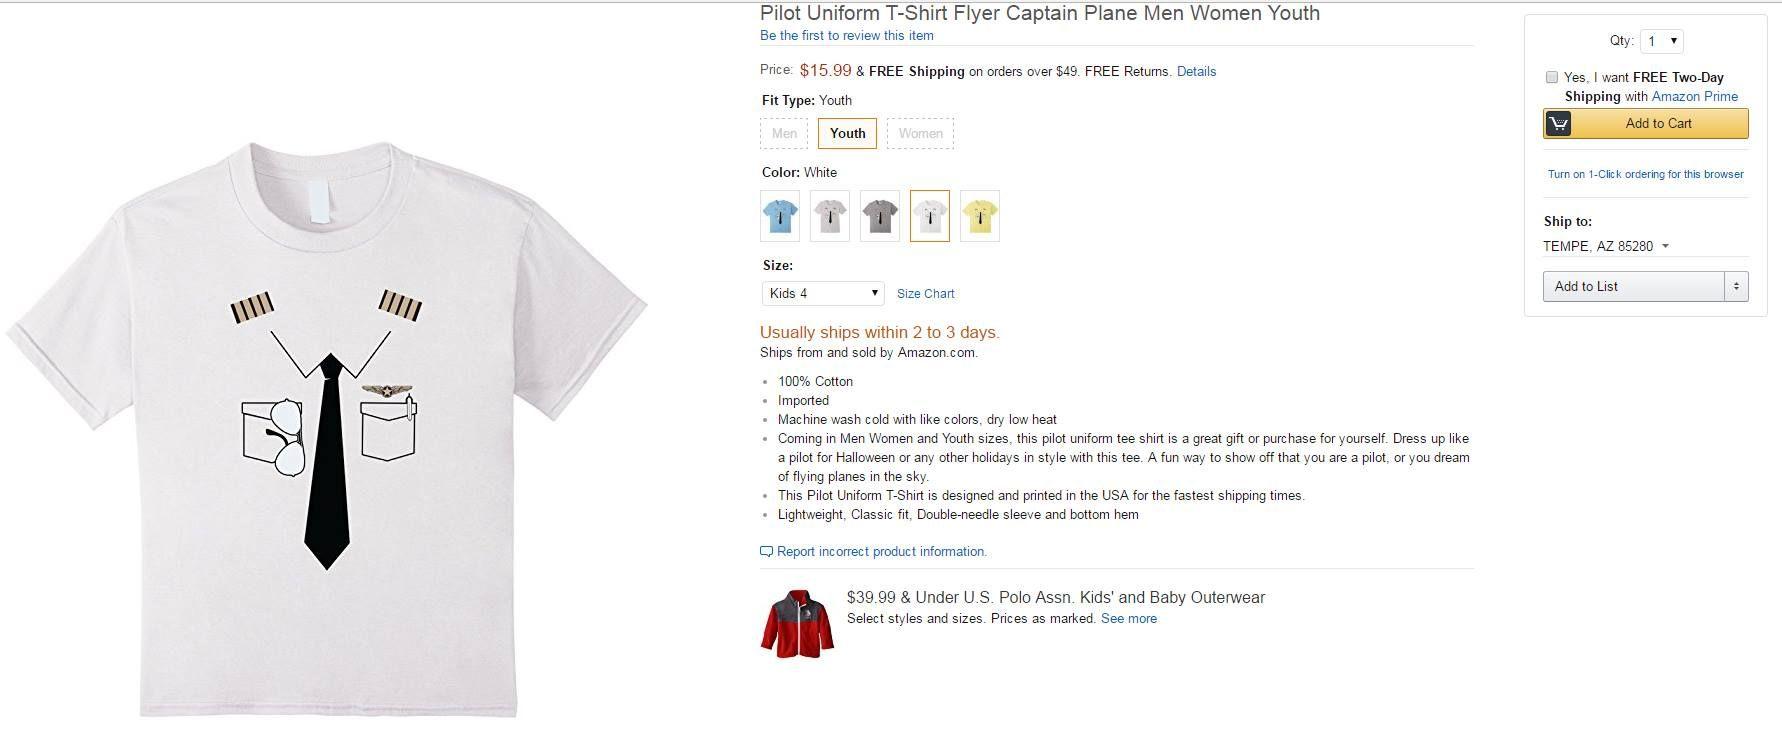 c3a63312 Hilarious knockoff of the Luso Aviation Pilot Uniform T-shirt - Nipple  Epaulets anyone?